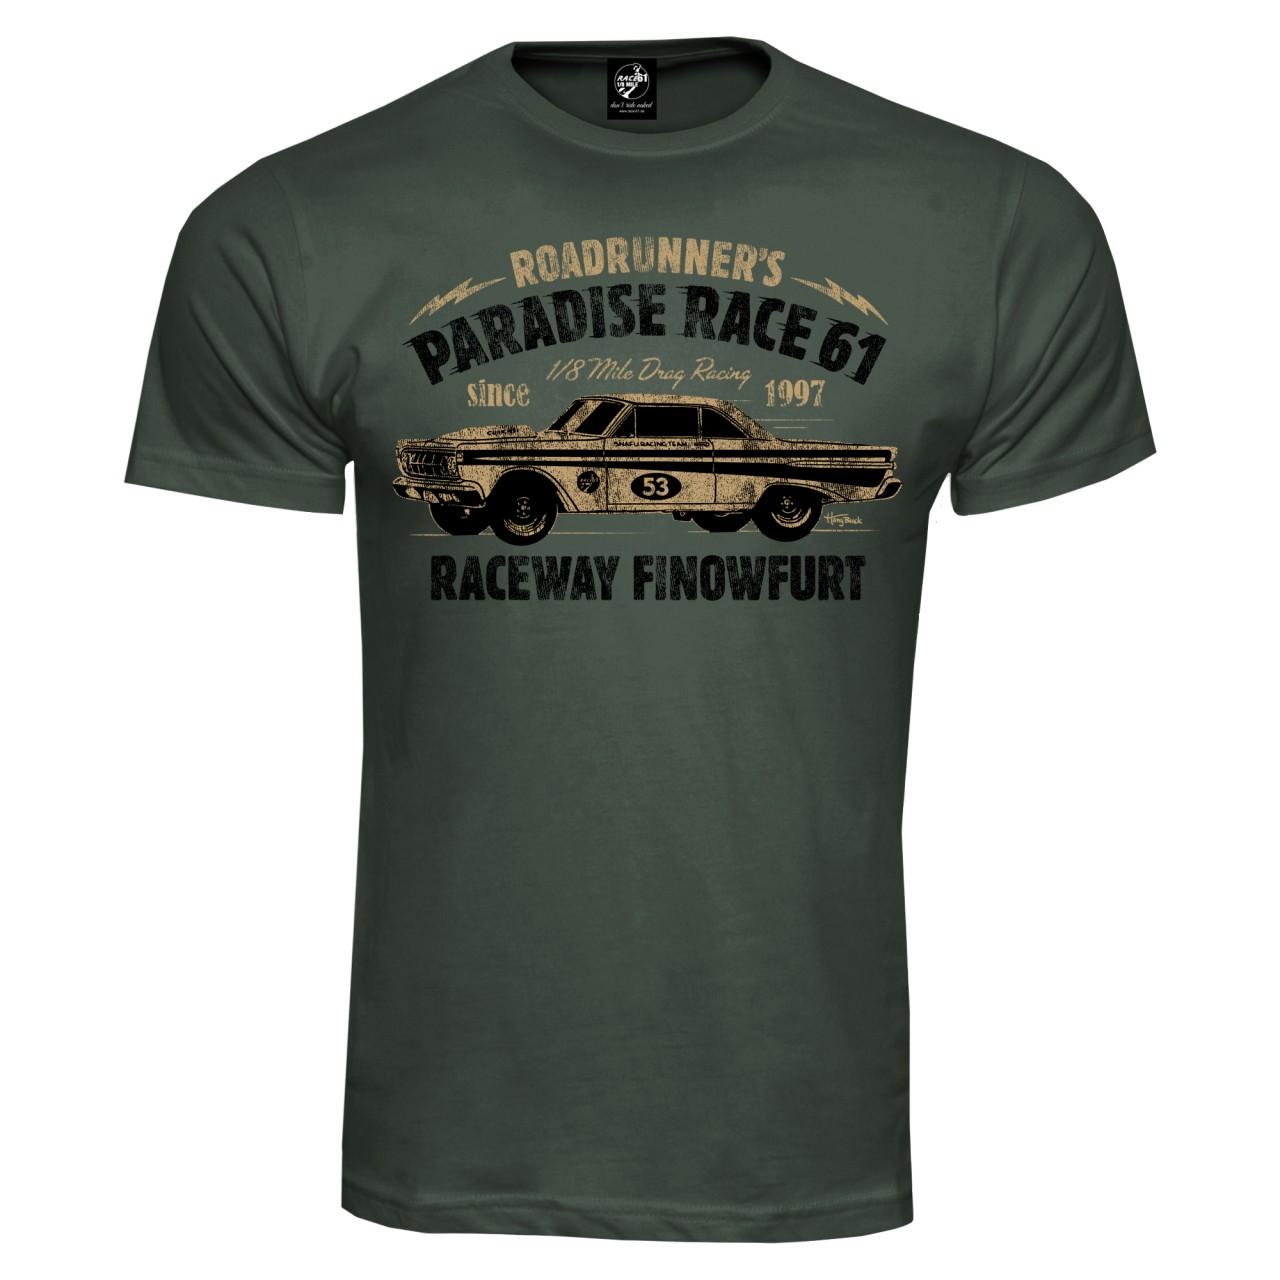 Race 61 T-Shirt 1/8 Mile Drag Racing 53 Khaki